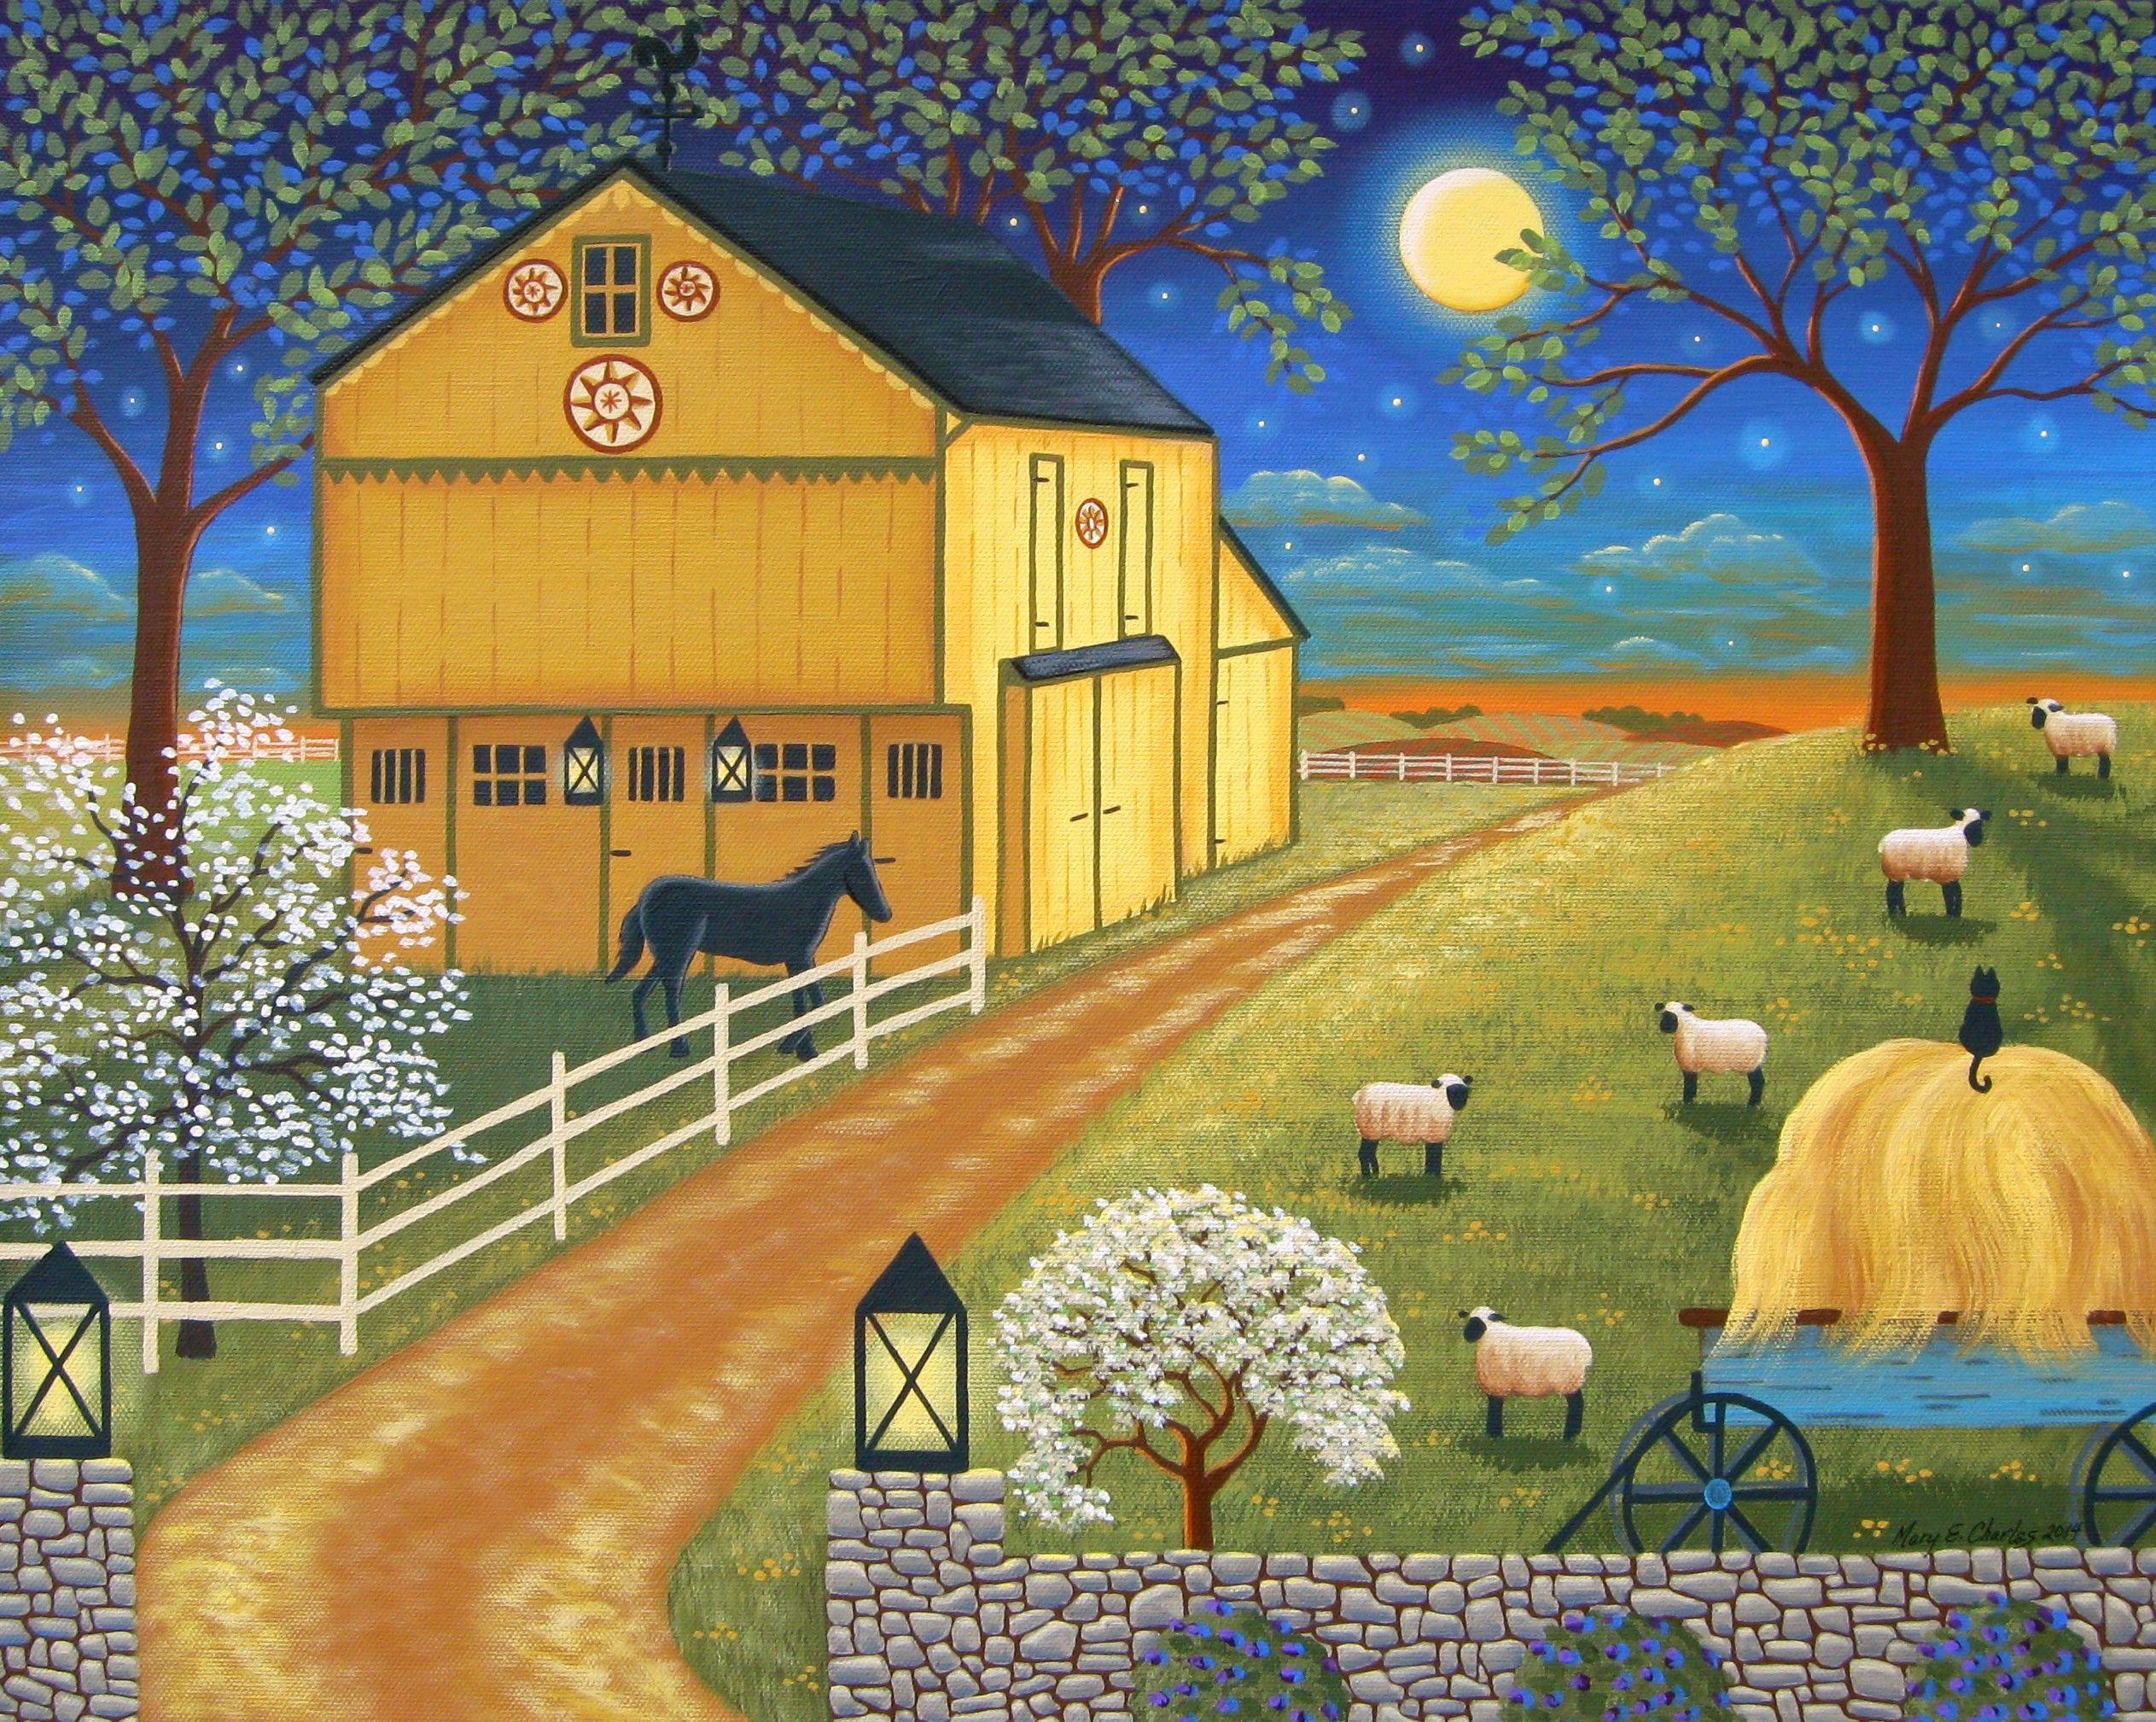 Mascot Mills Barn Original Folk Art Painting By Mary